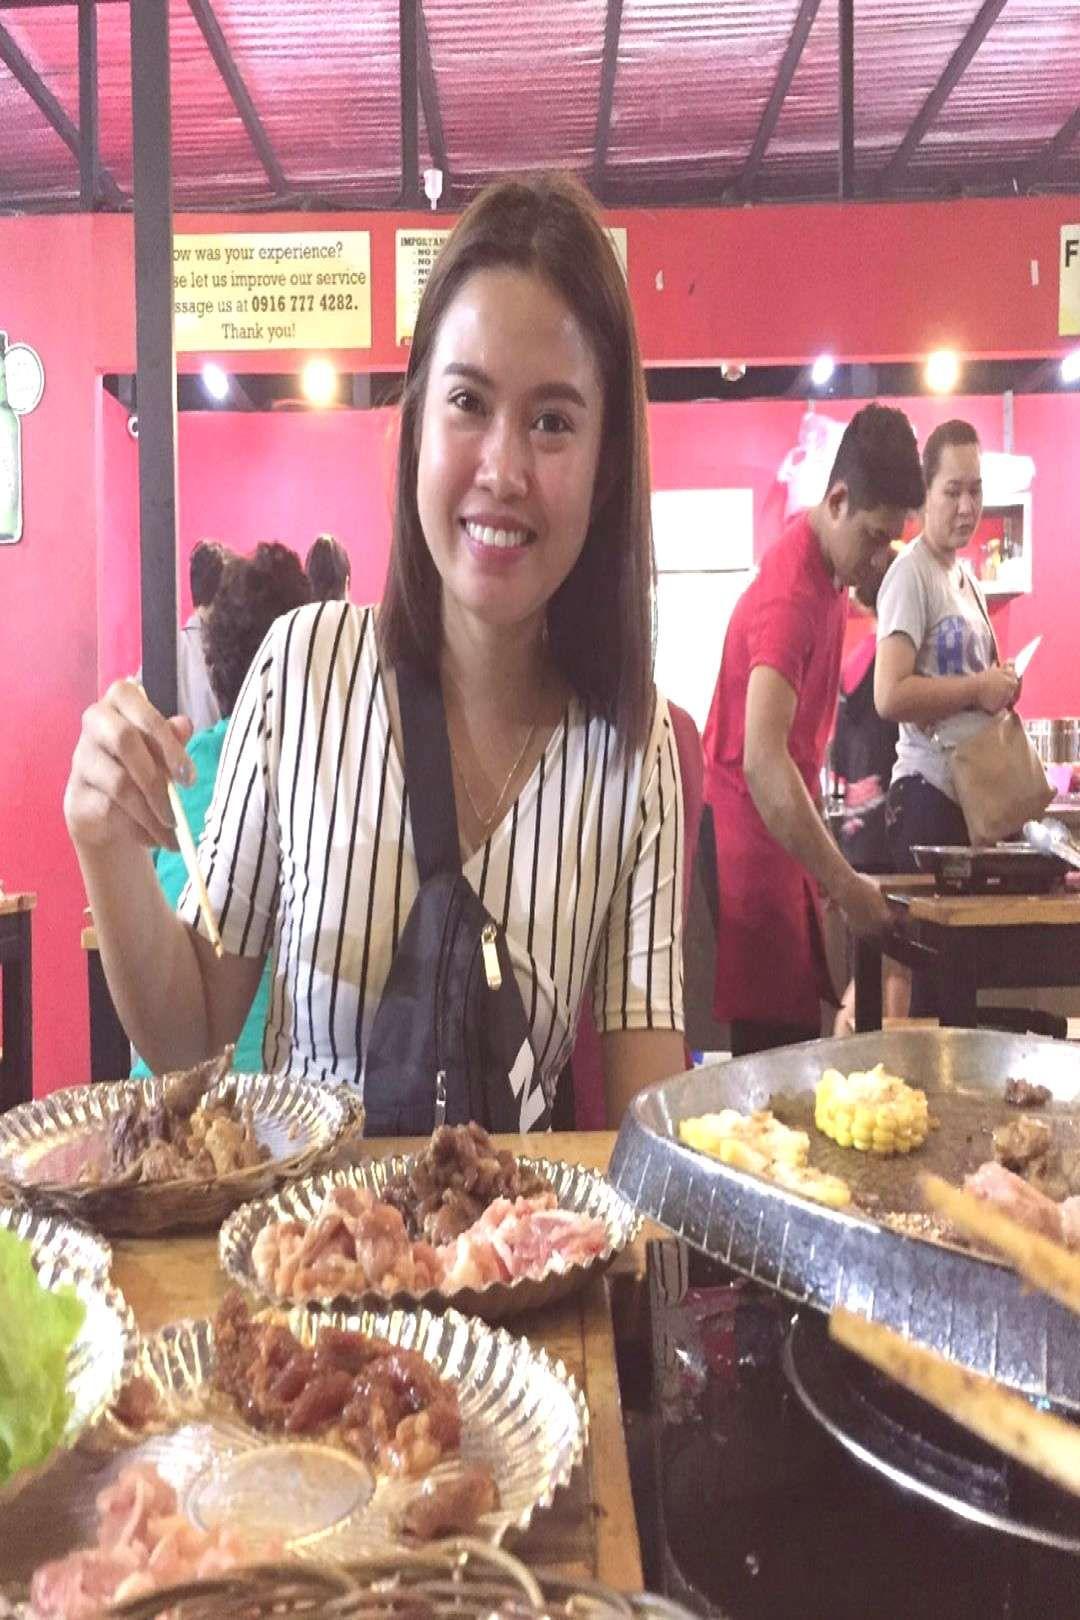 #sittingpeople #peoplepeople #koreanfood #samgyupsal #eatingfood #unlipork #samgyup #indoor #have #time #eat #and #to #2 Have time to samgyup #samgyupsal #eat #koreanfood #unlipork You can find Korean fo...